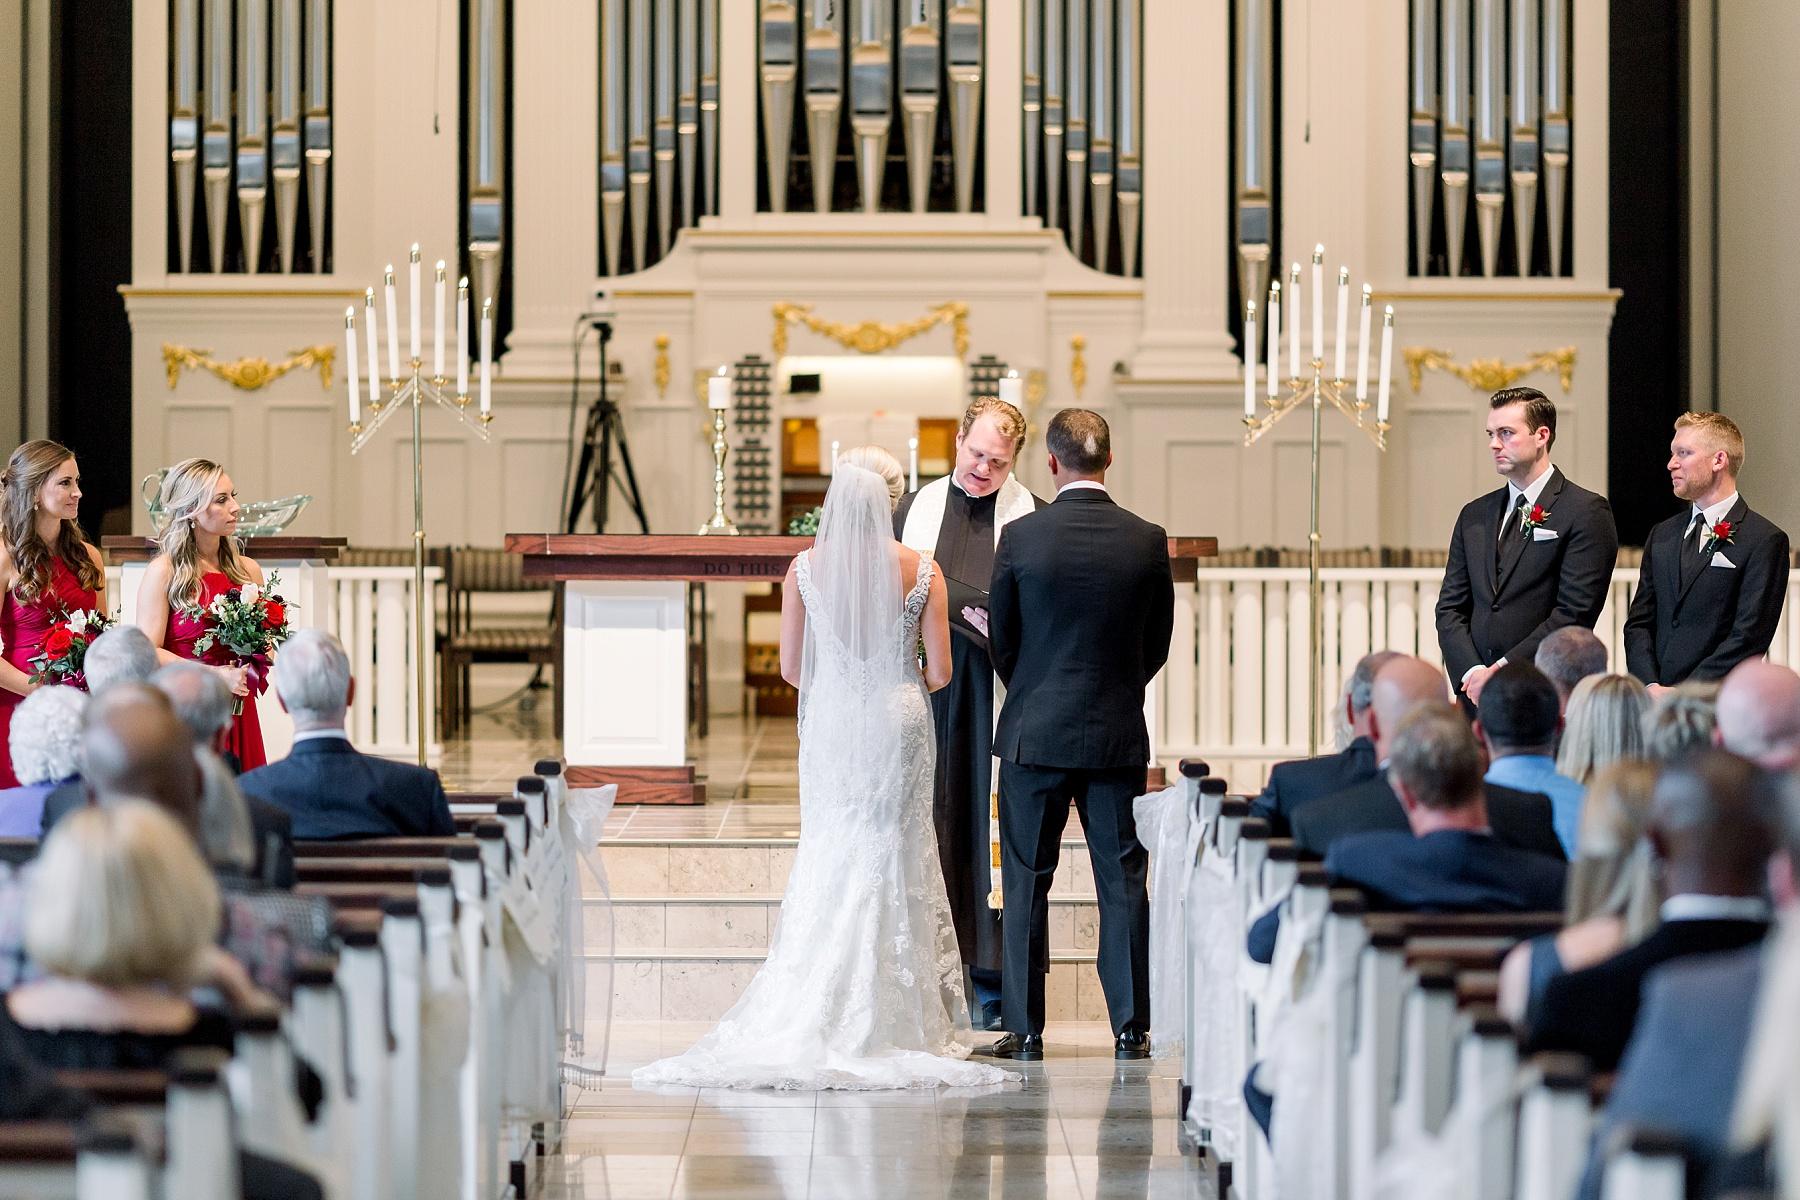 midwest-adventurous-wedding-photographer-elizabeth-ladean-photography-photo_4770.jpg